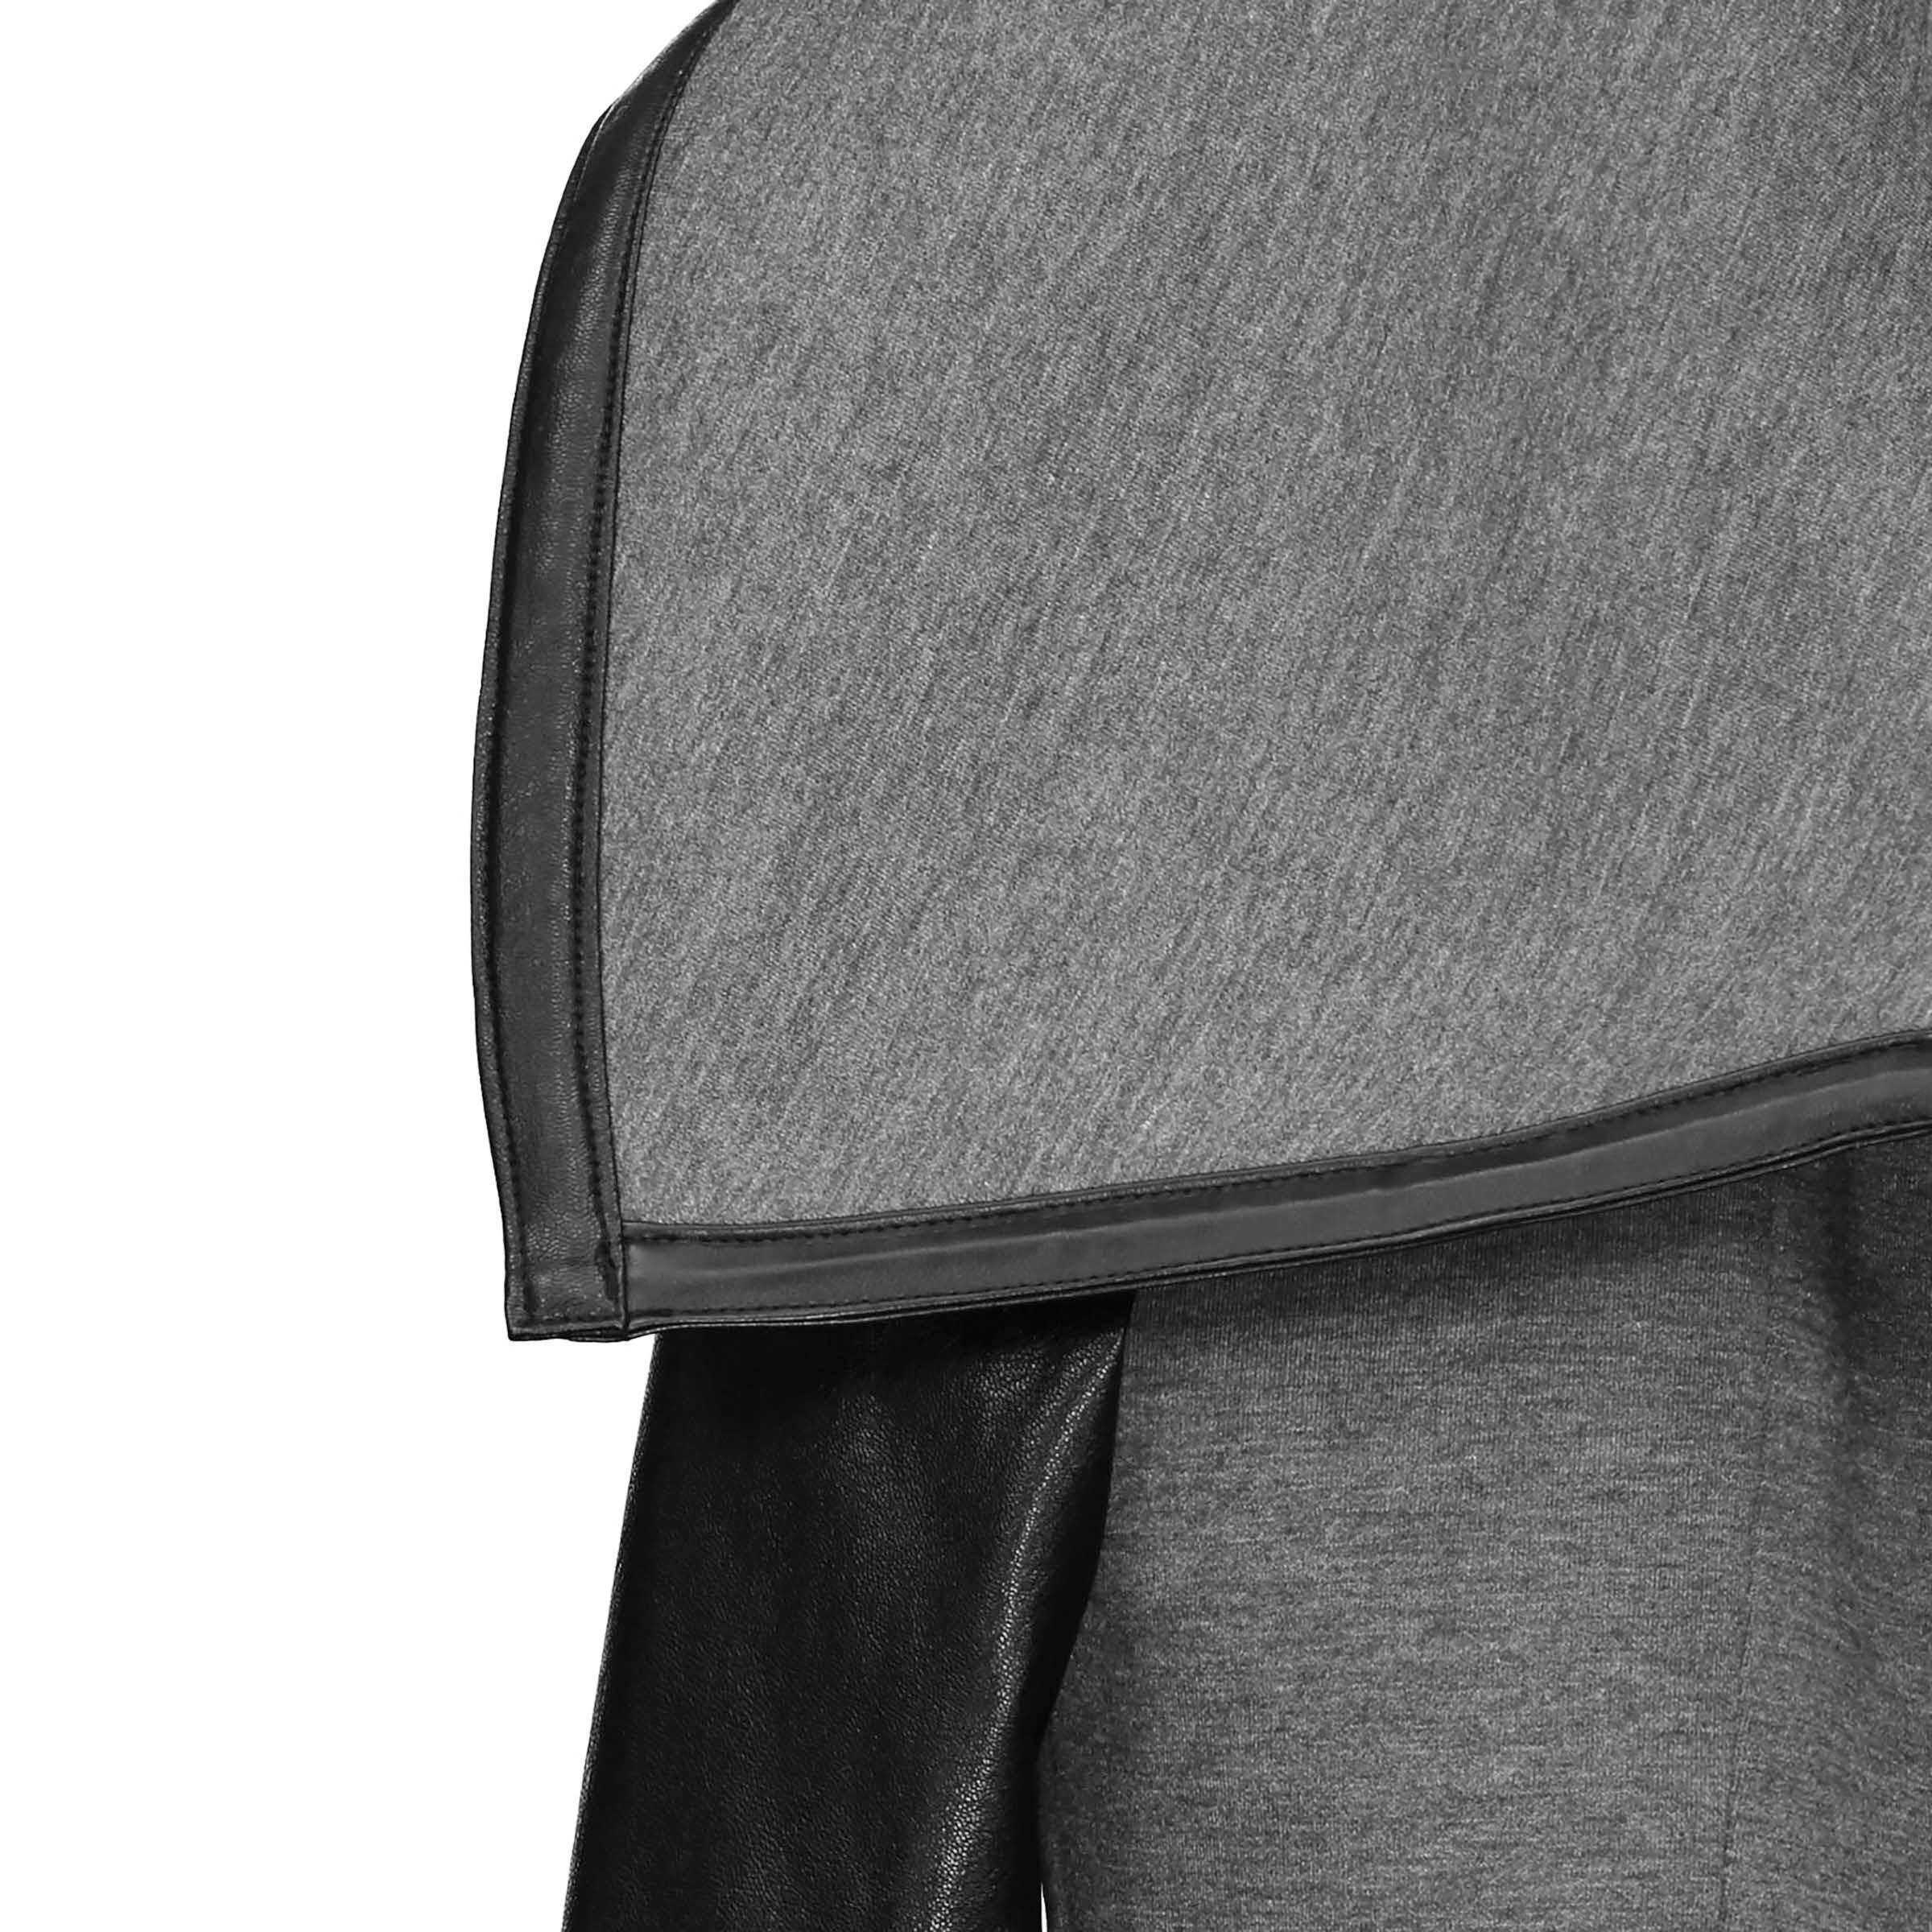 Grey faux leather PU Jacket Women  fashion rose Winter AutumnMotorcycle Jacket Black faux leather  Coat Outerwear Gothic enlarge